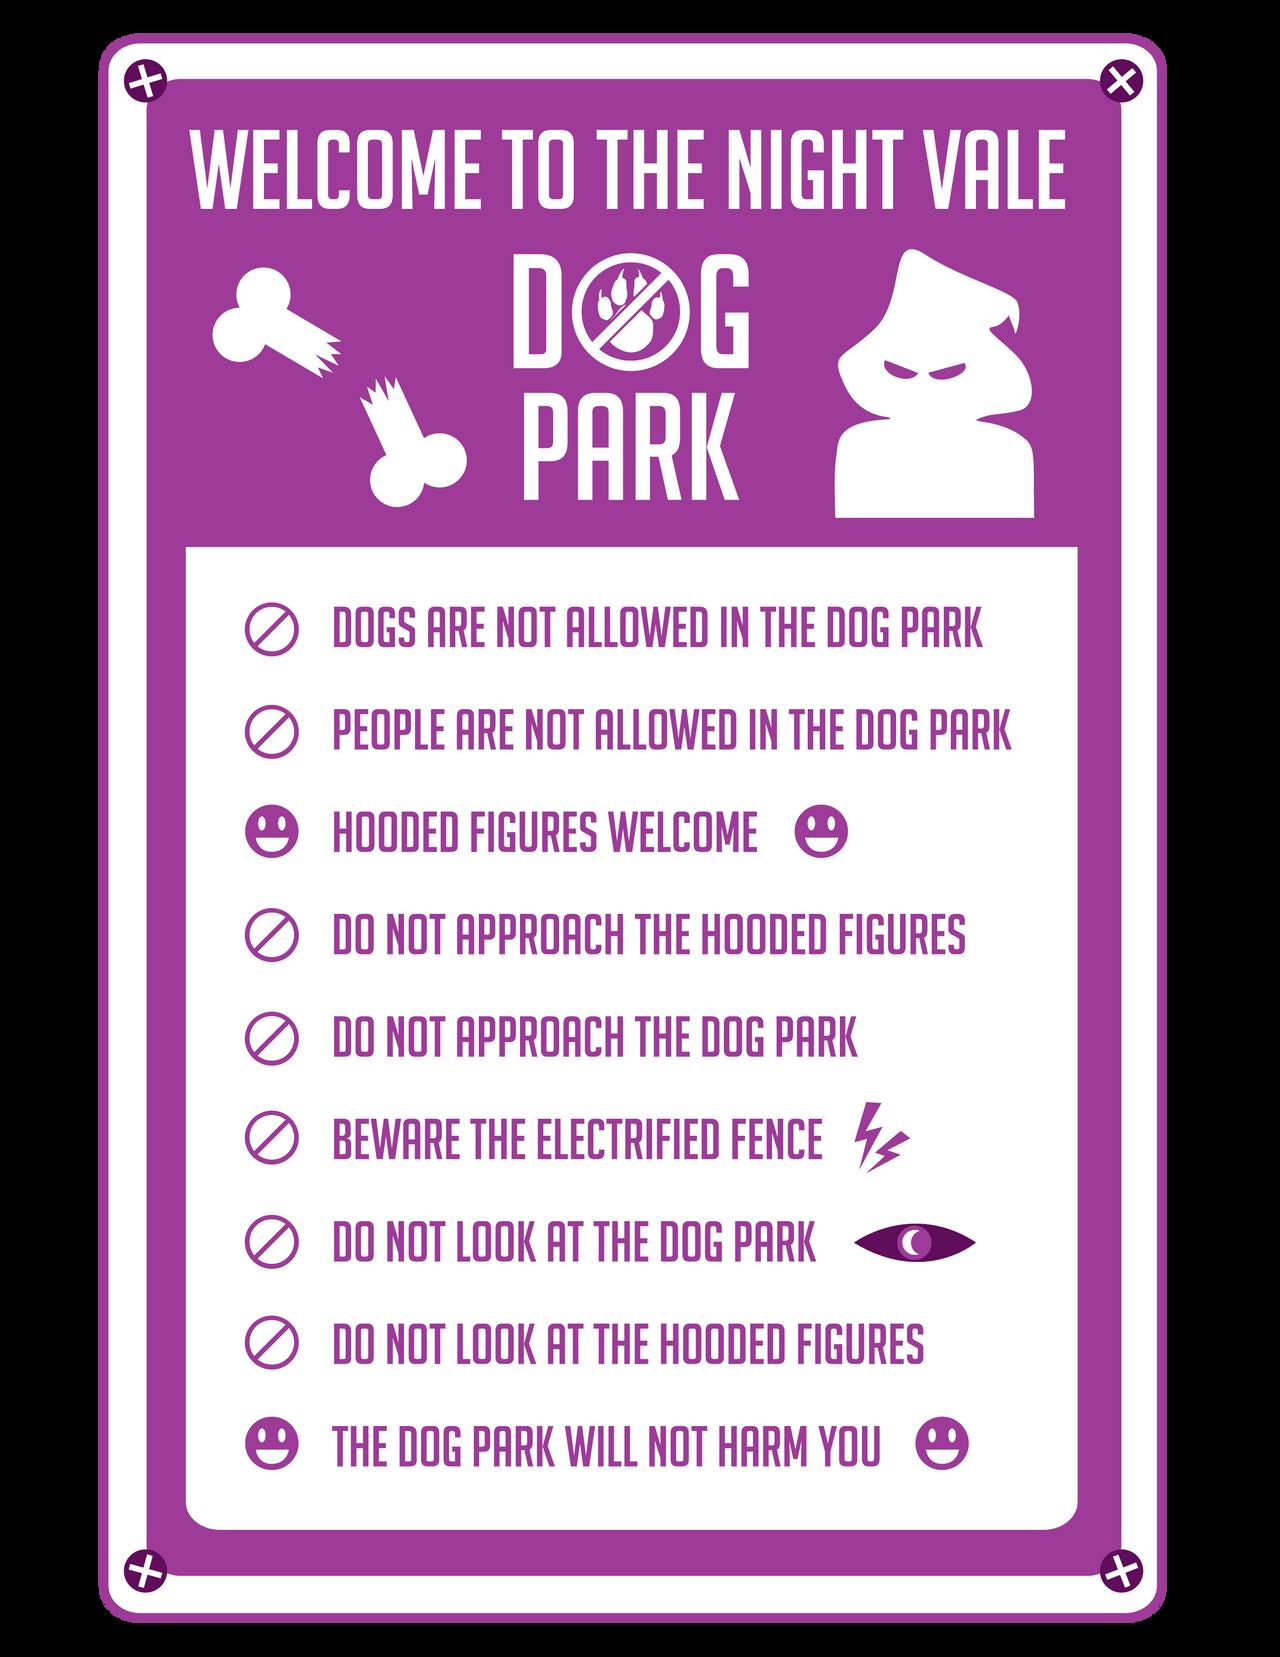 Night Vale Dog Park Rules